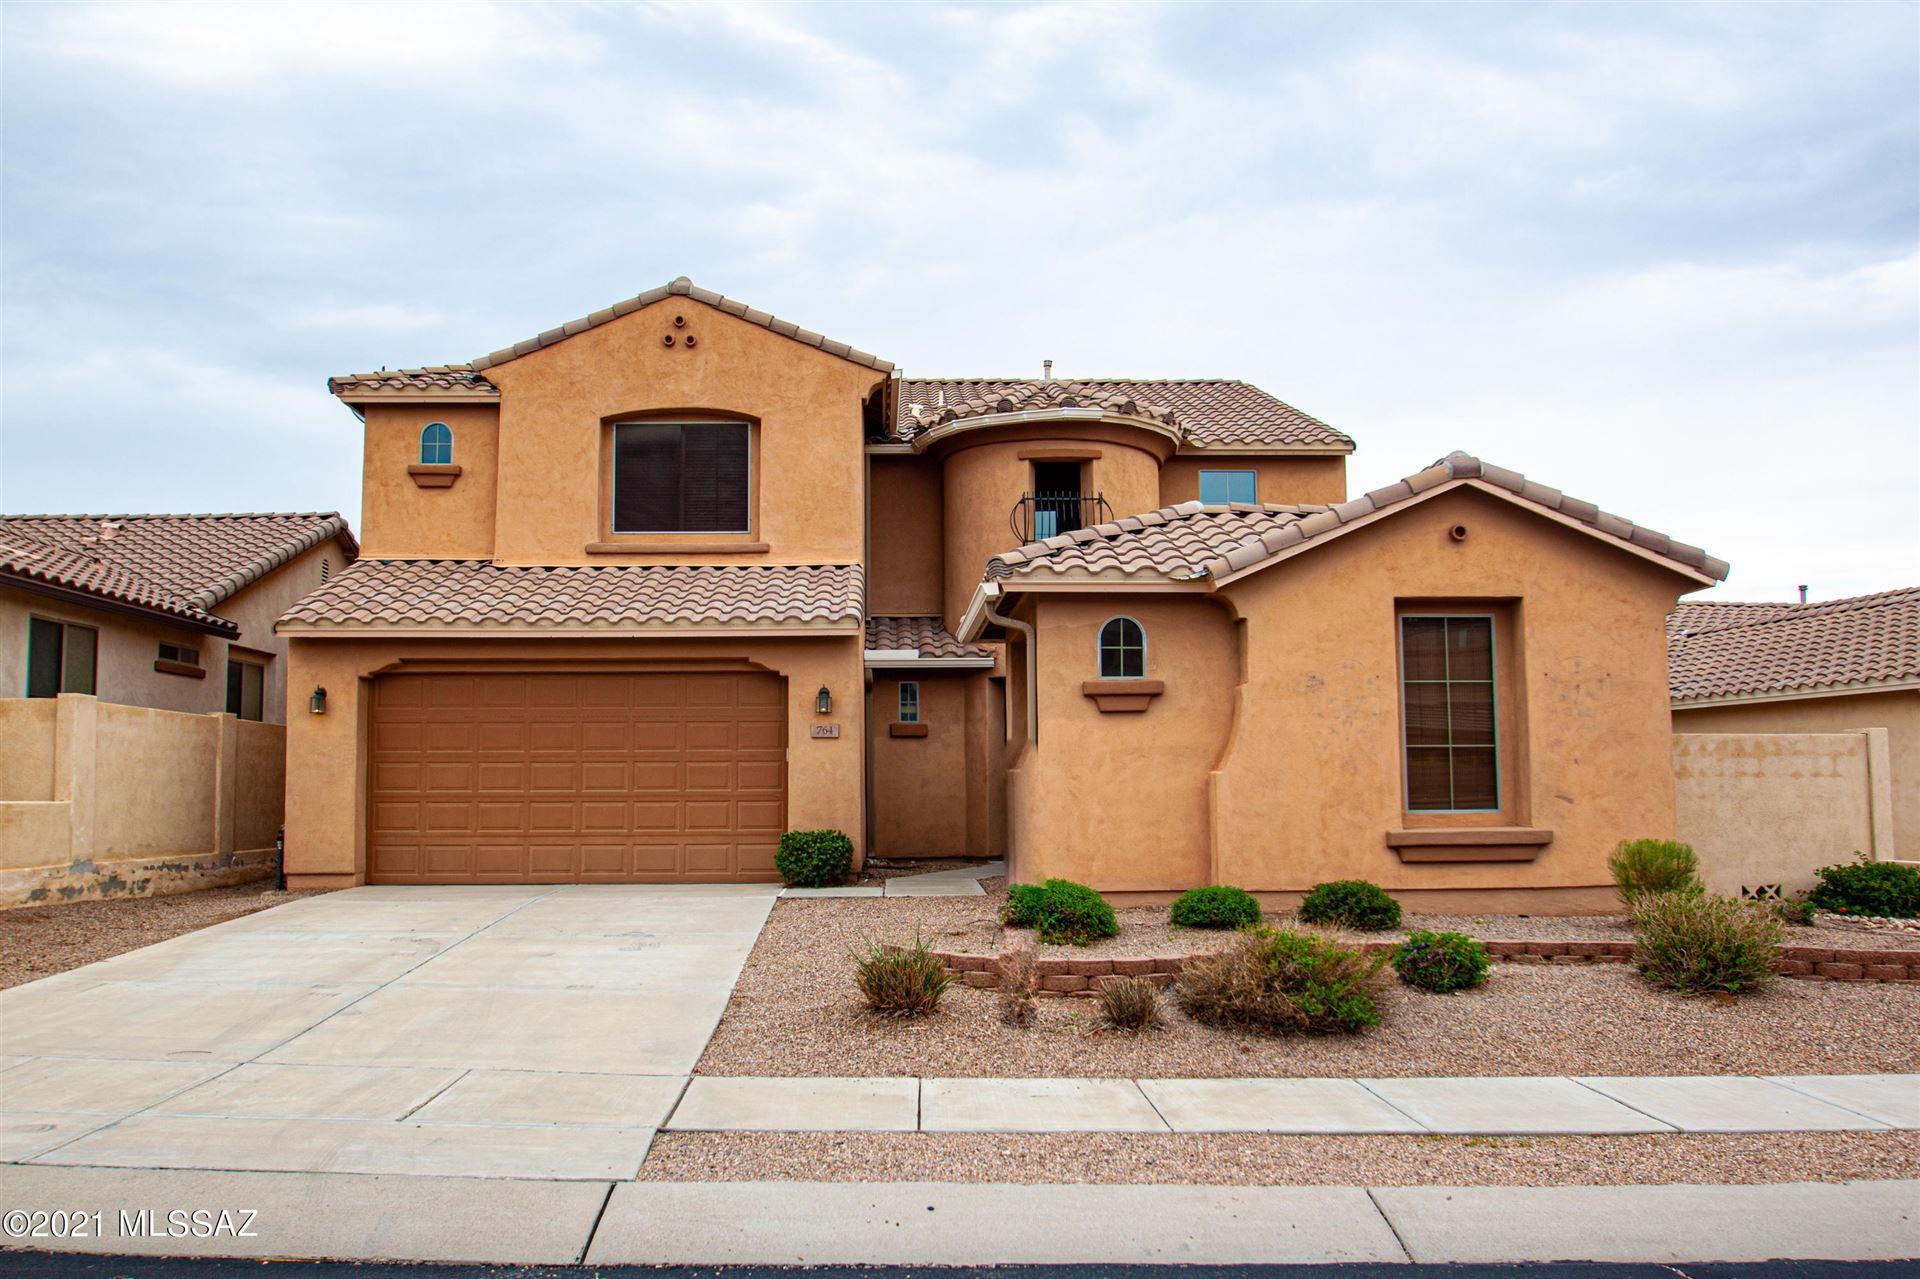 764 W Camino Tunera, Sahuarita, AZ 85629 - MLS#: 22119067